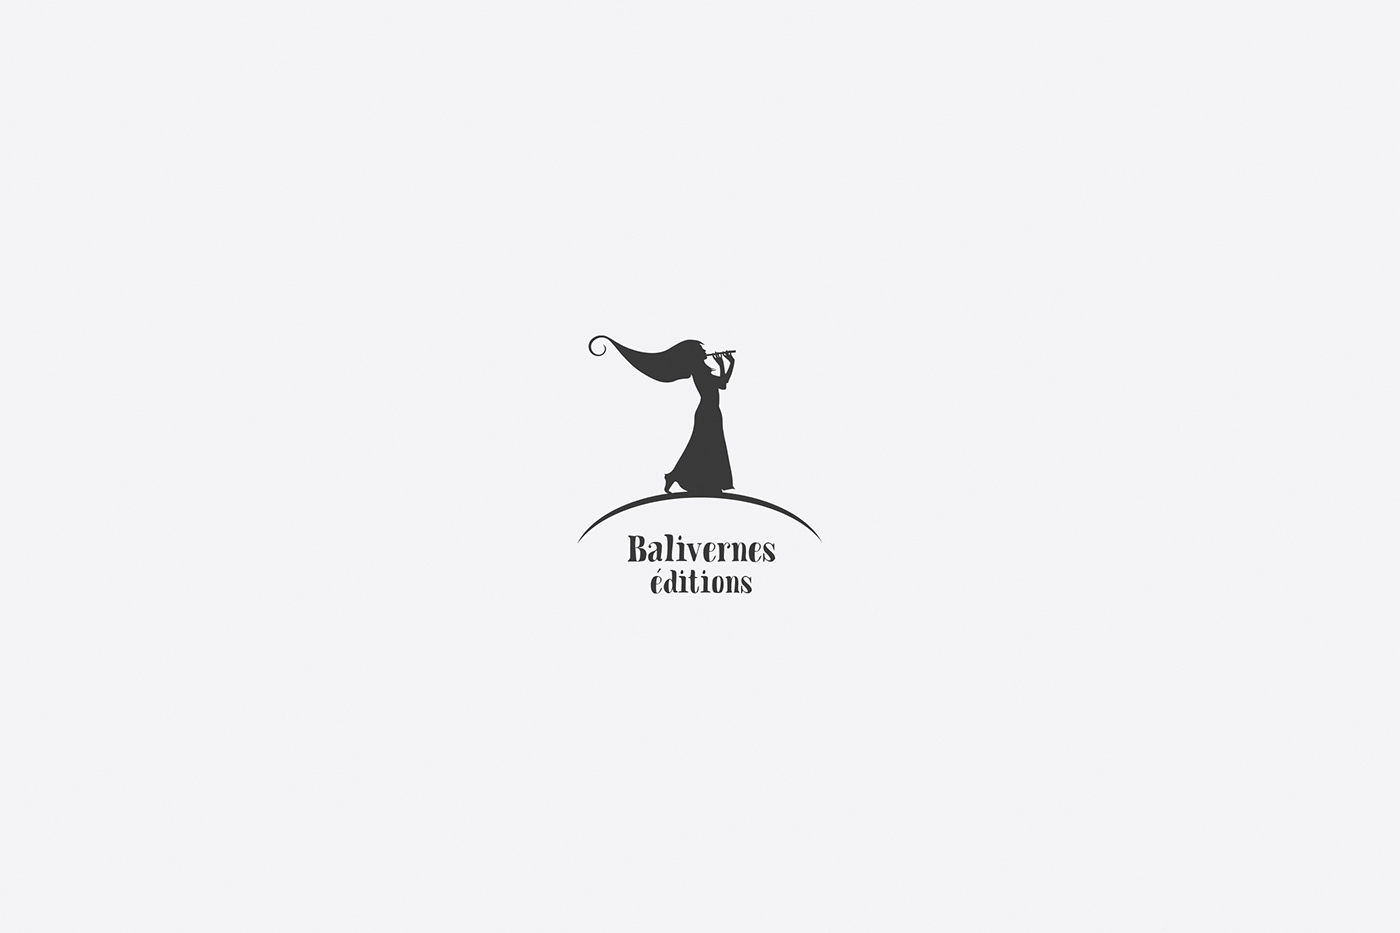 lecoupdulapin balivernes éditions logo